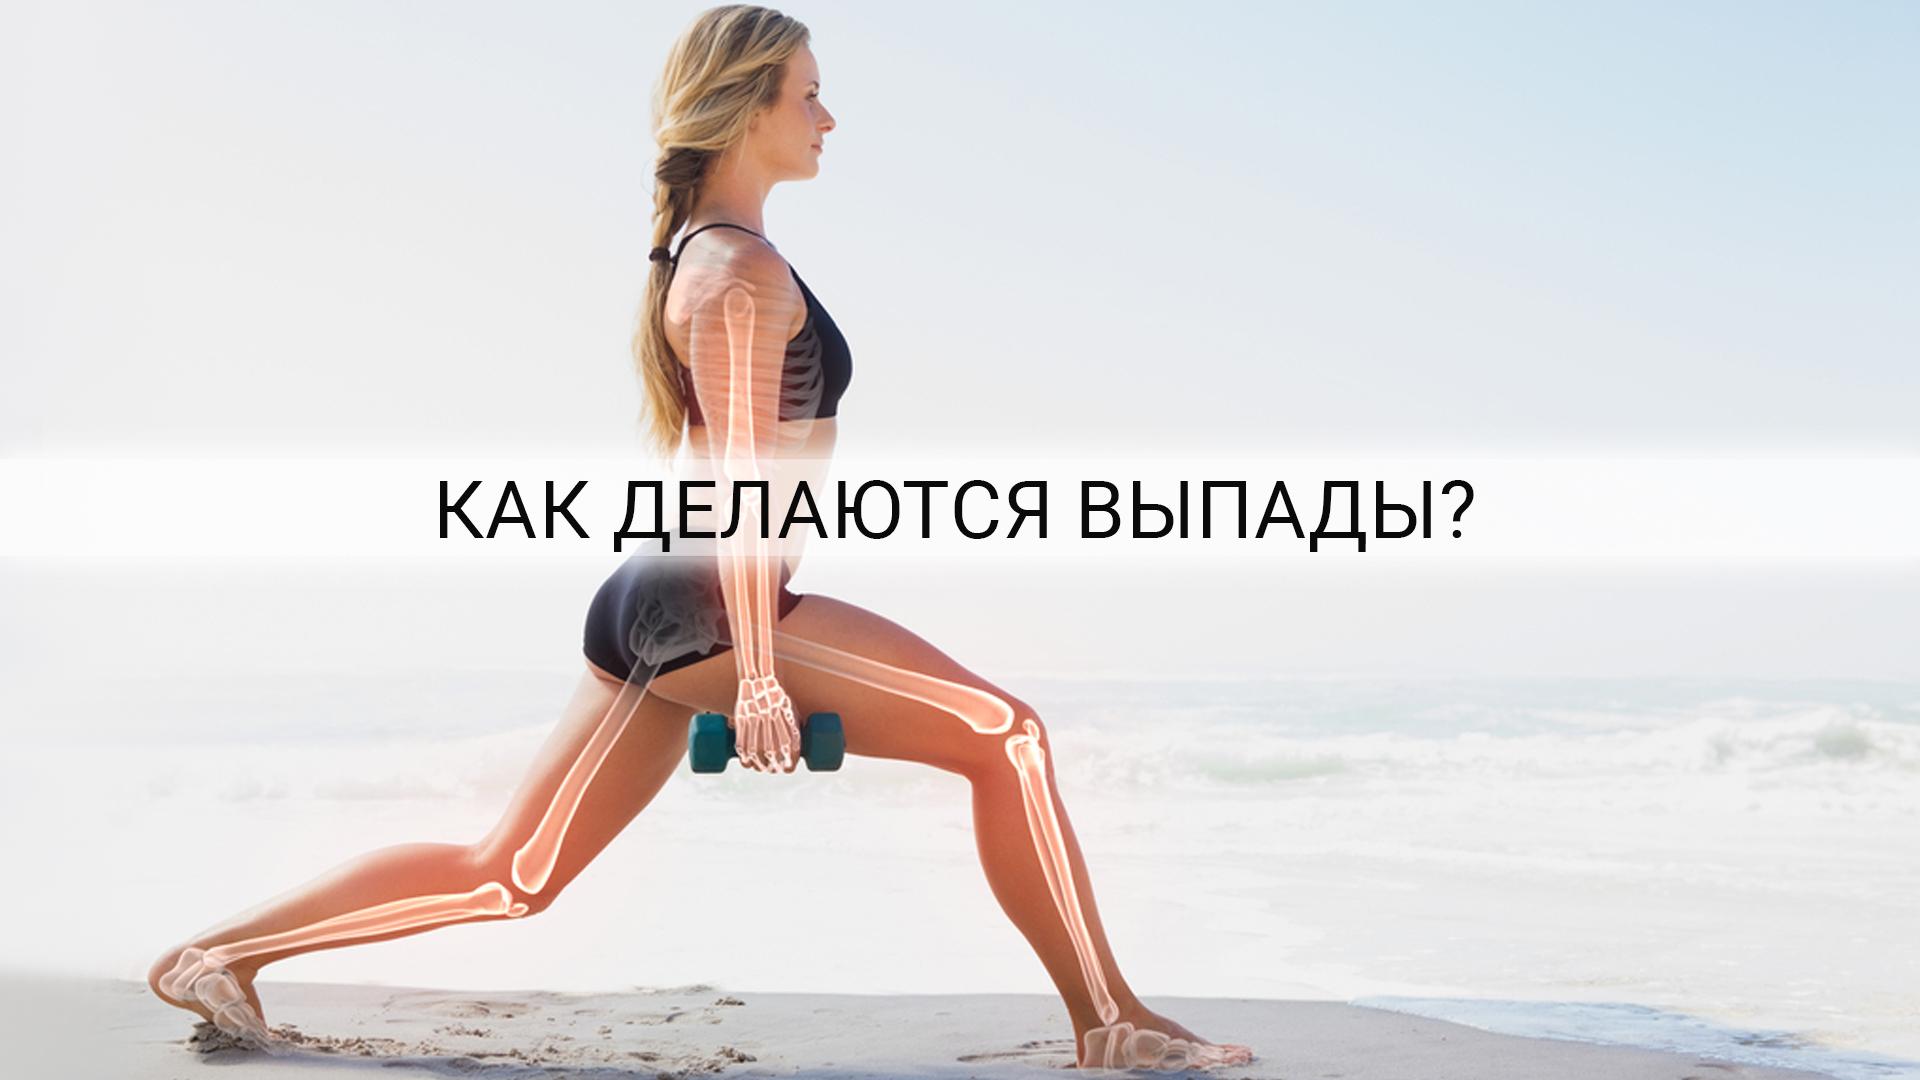 Порно русских мамочек на PornoRussia.TV